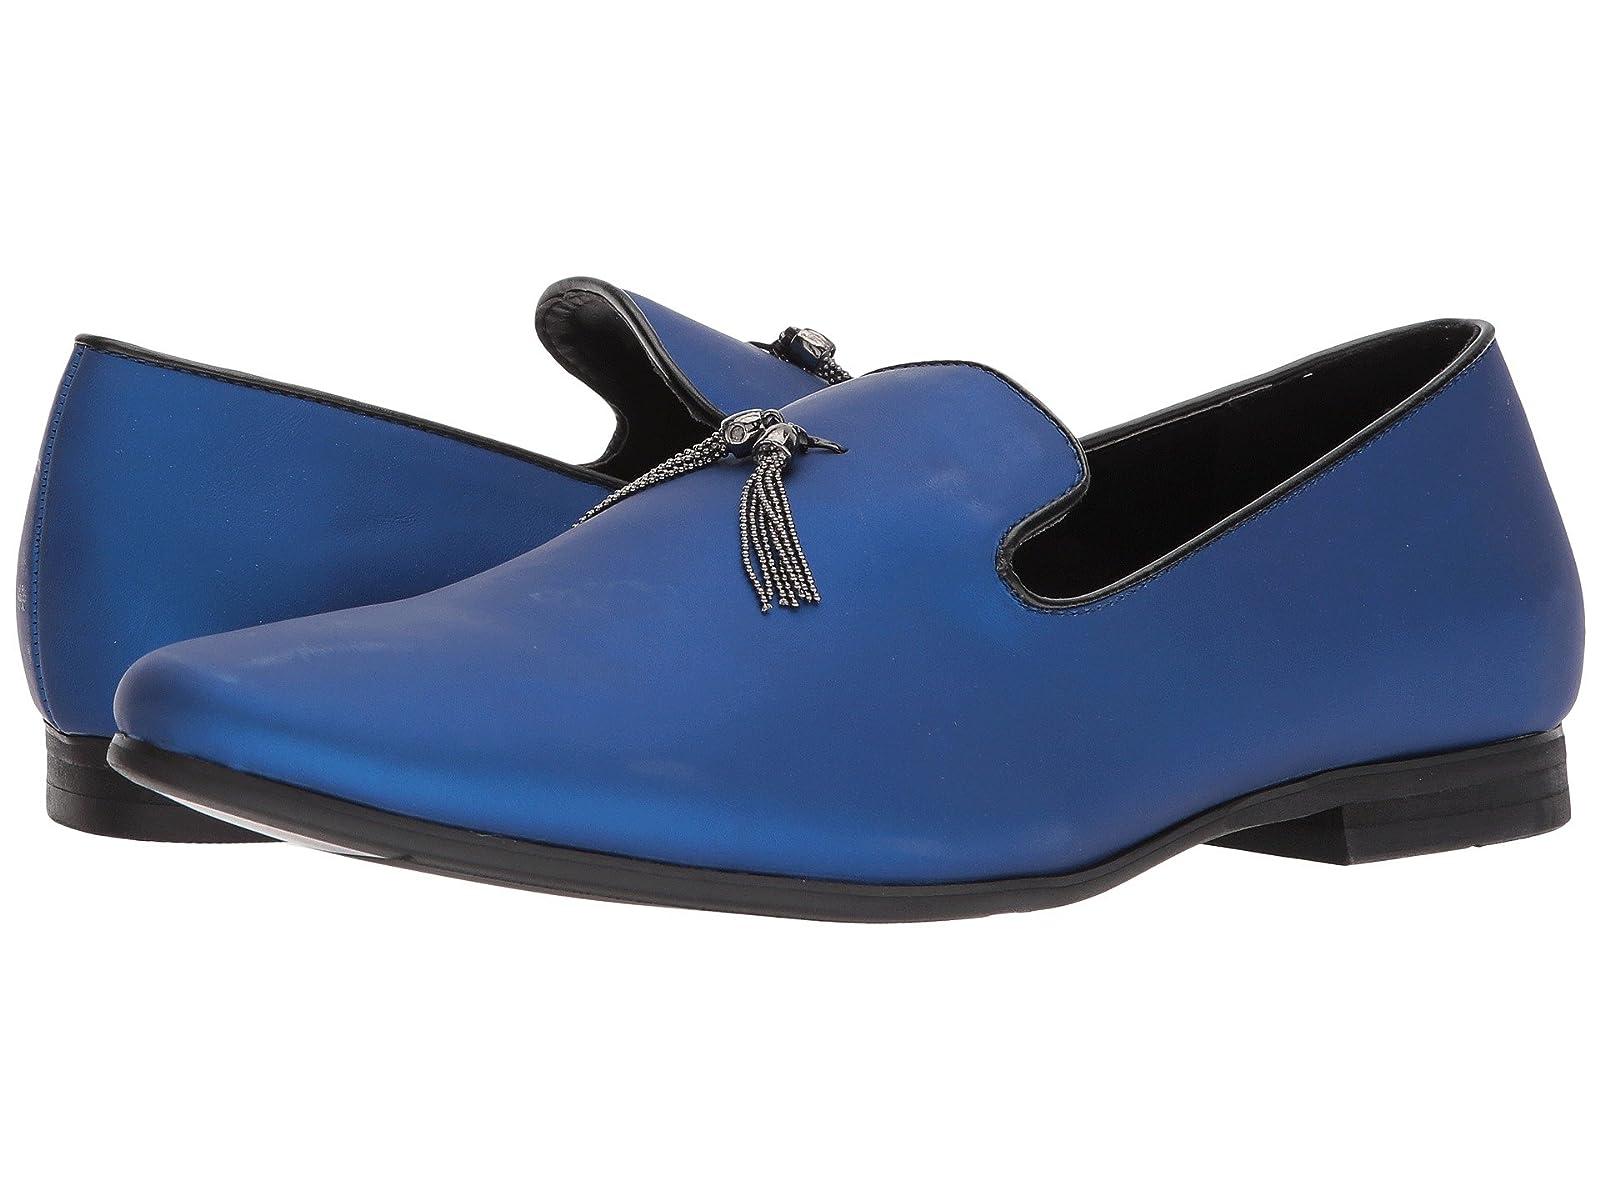 Giorgio Brutini CrispAtmospheric grades have affordable shoes